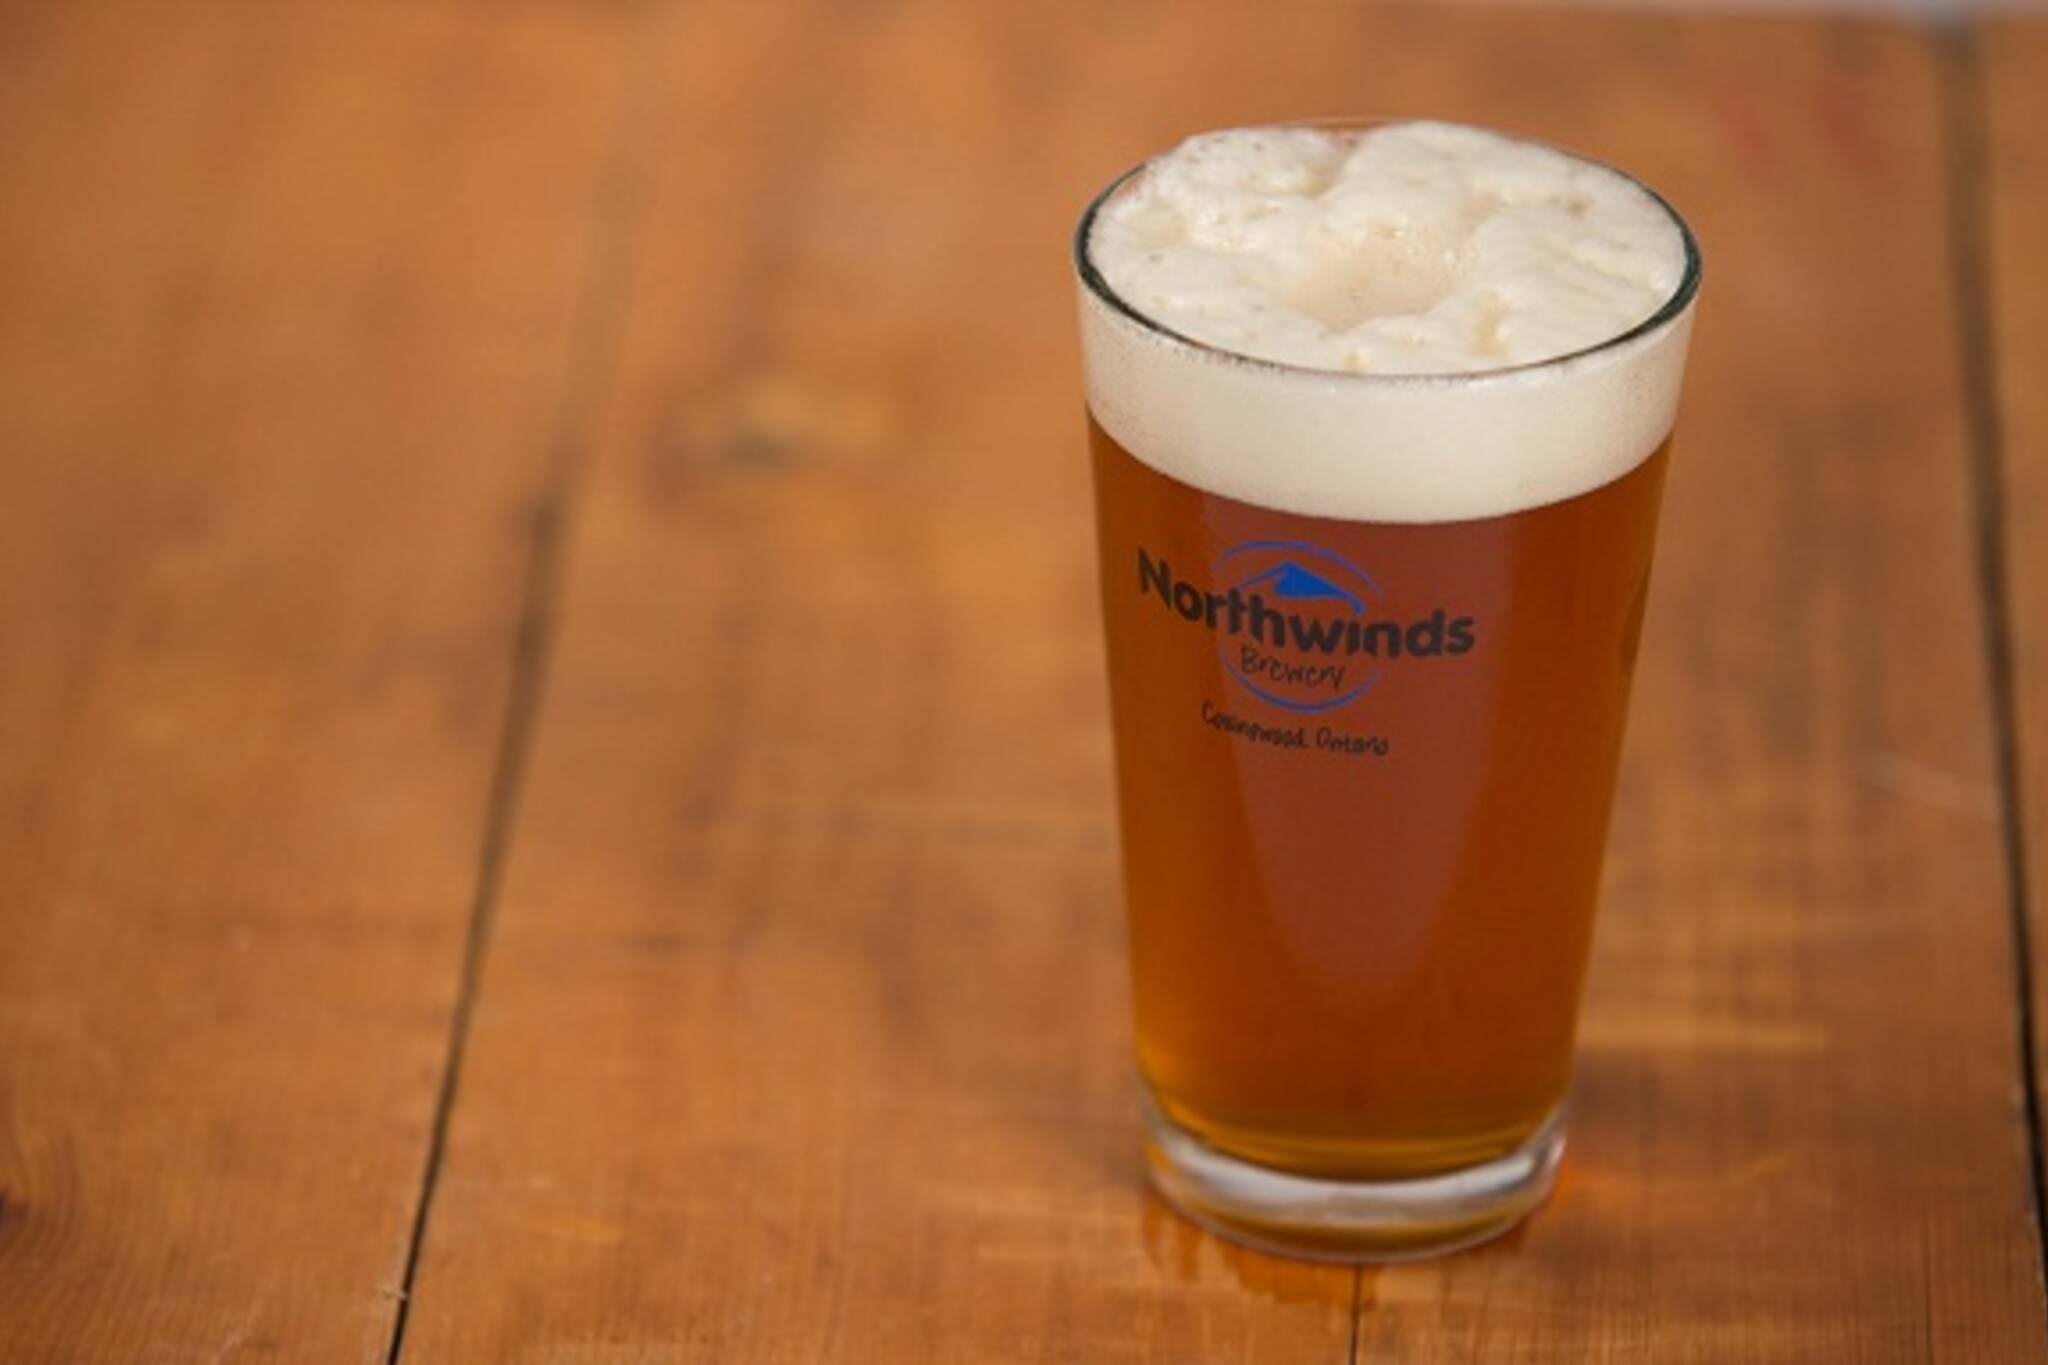 Northwinds Brewery Toronto